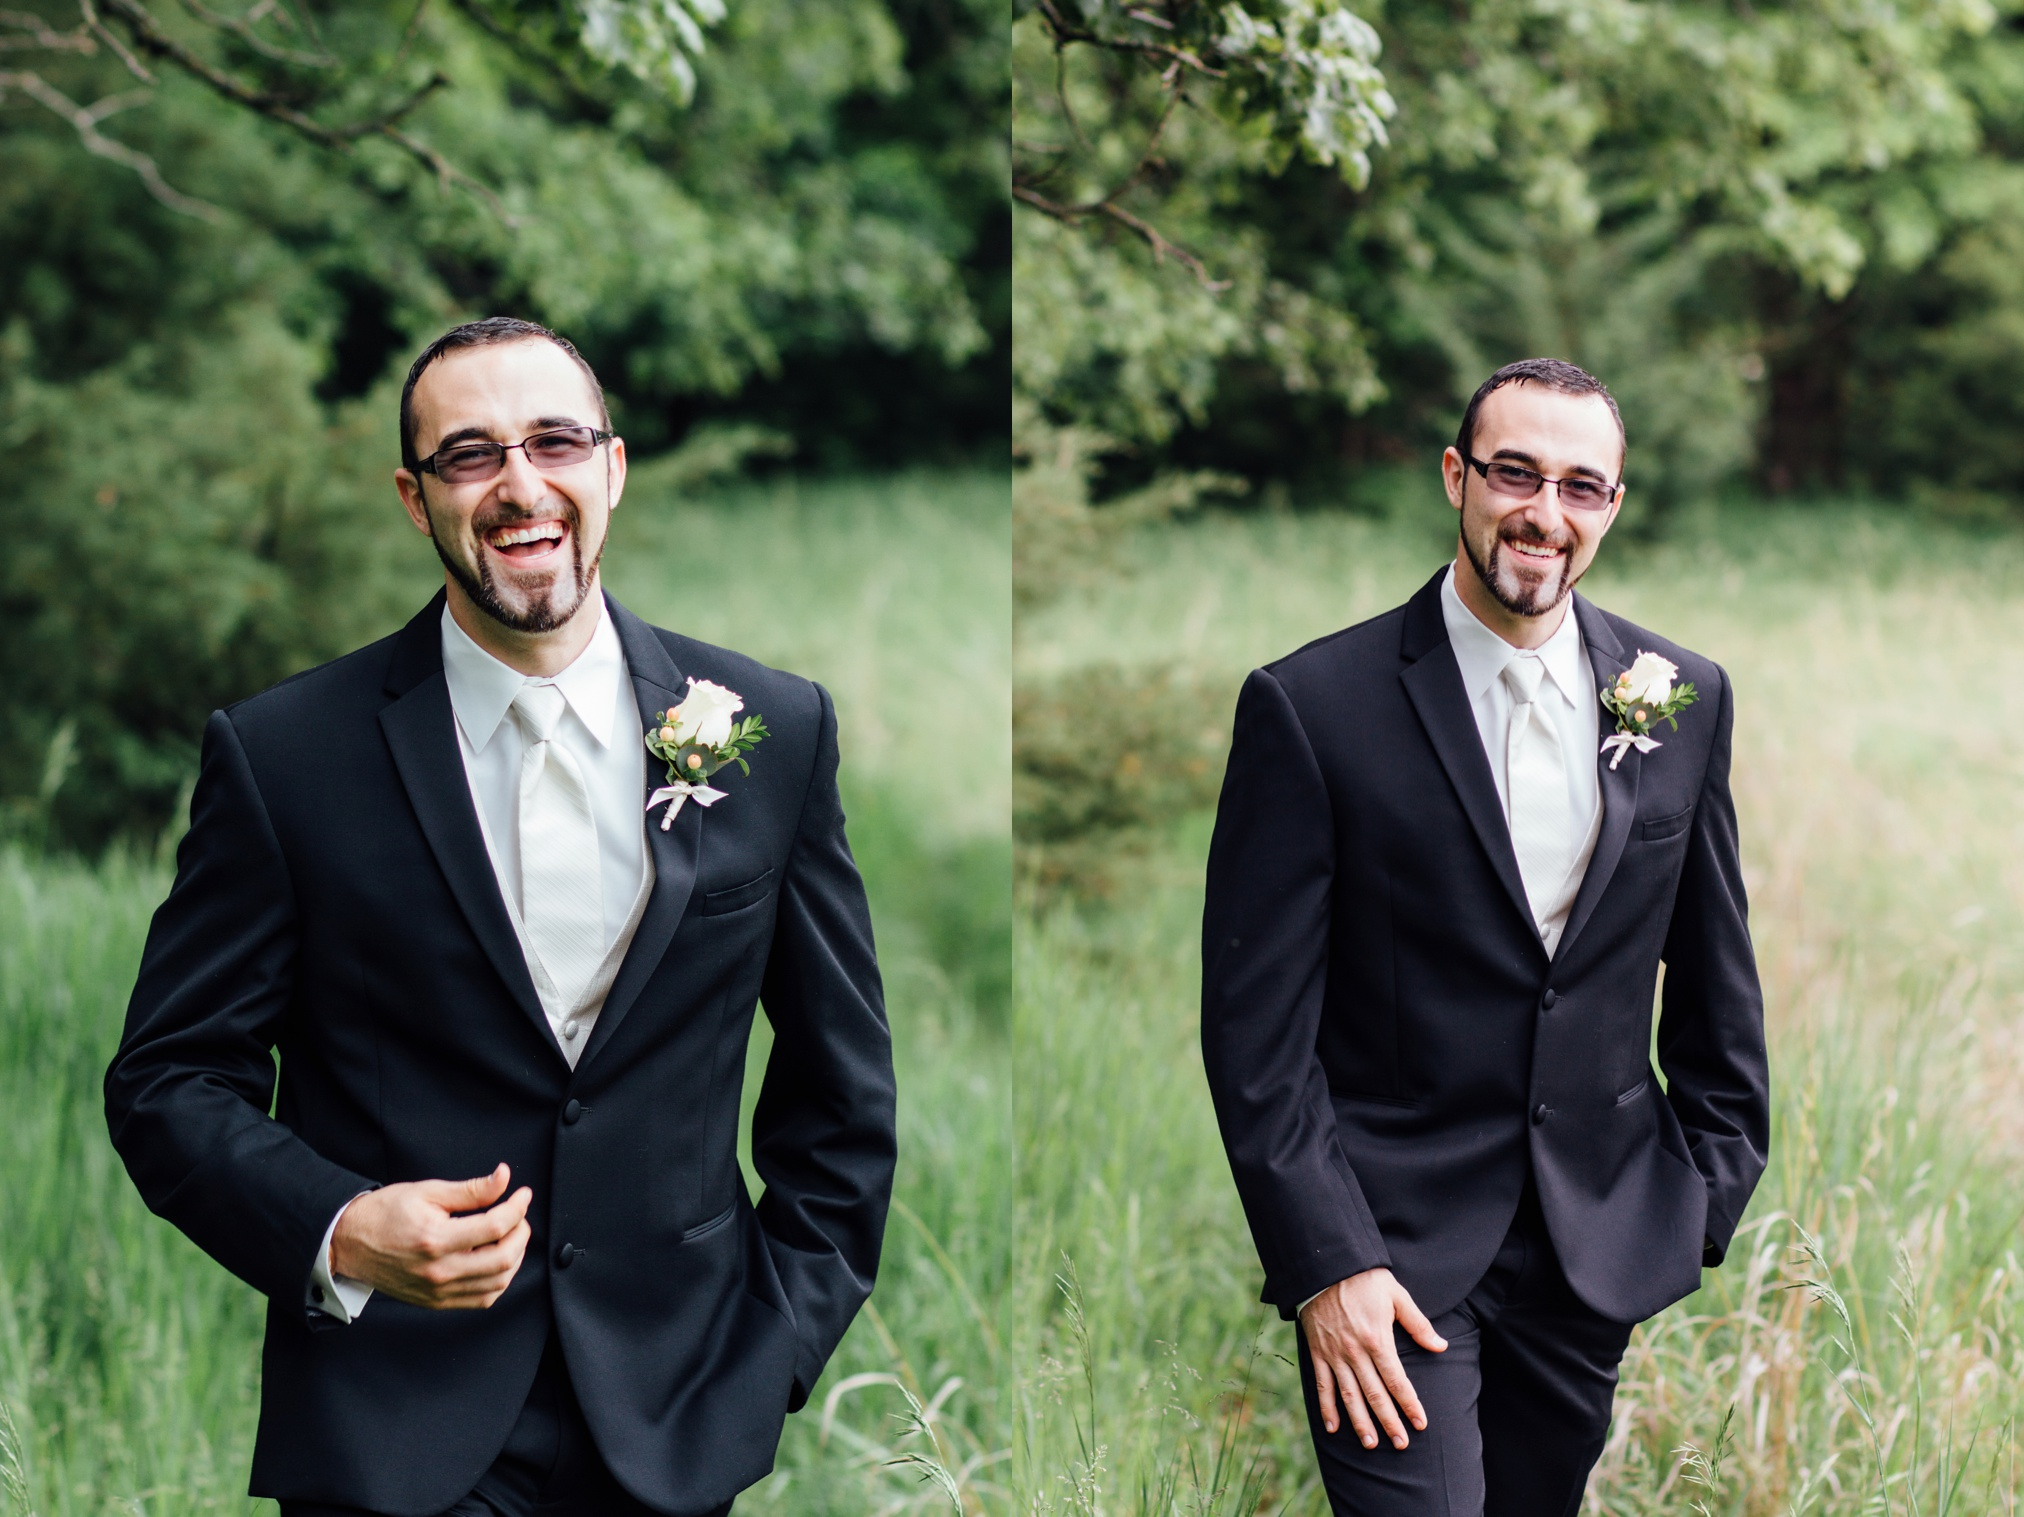 schmid_wedding-176.jpg